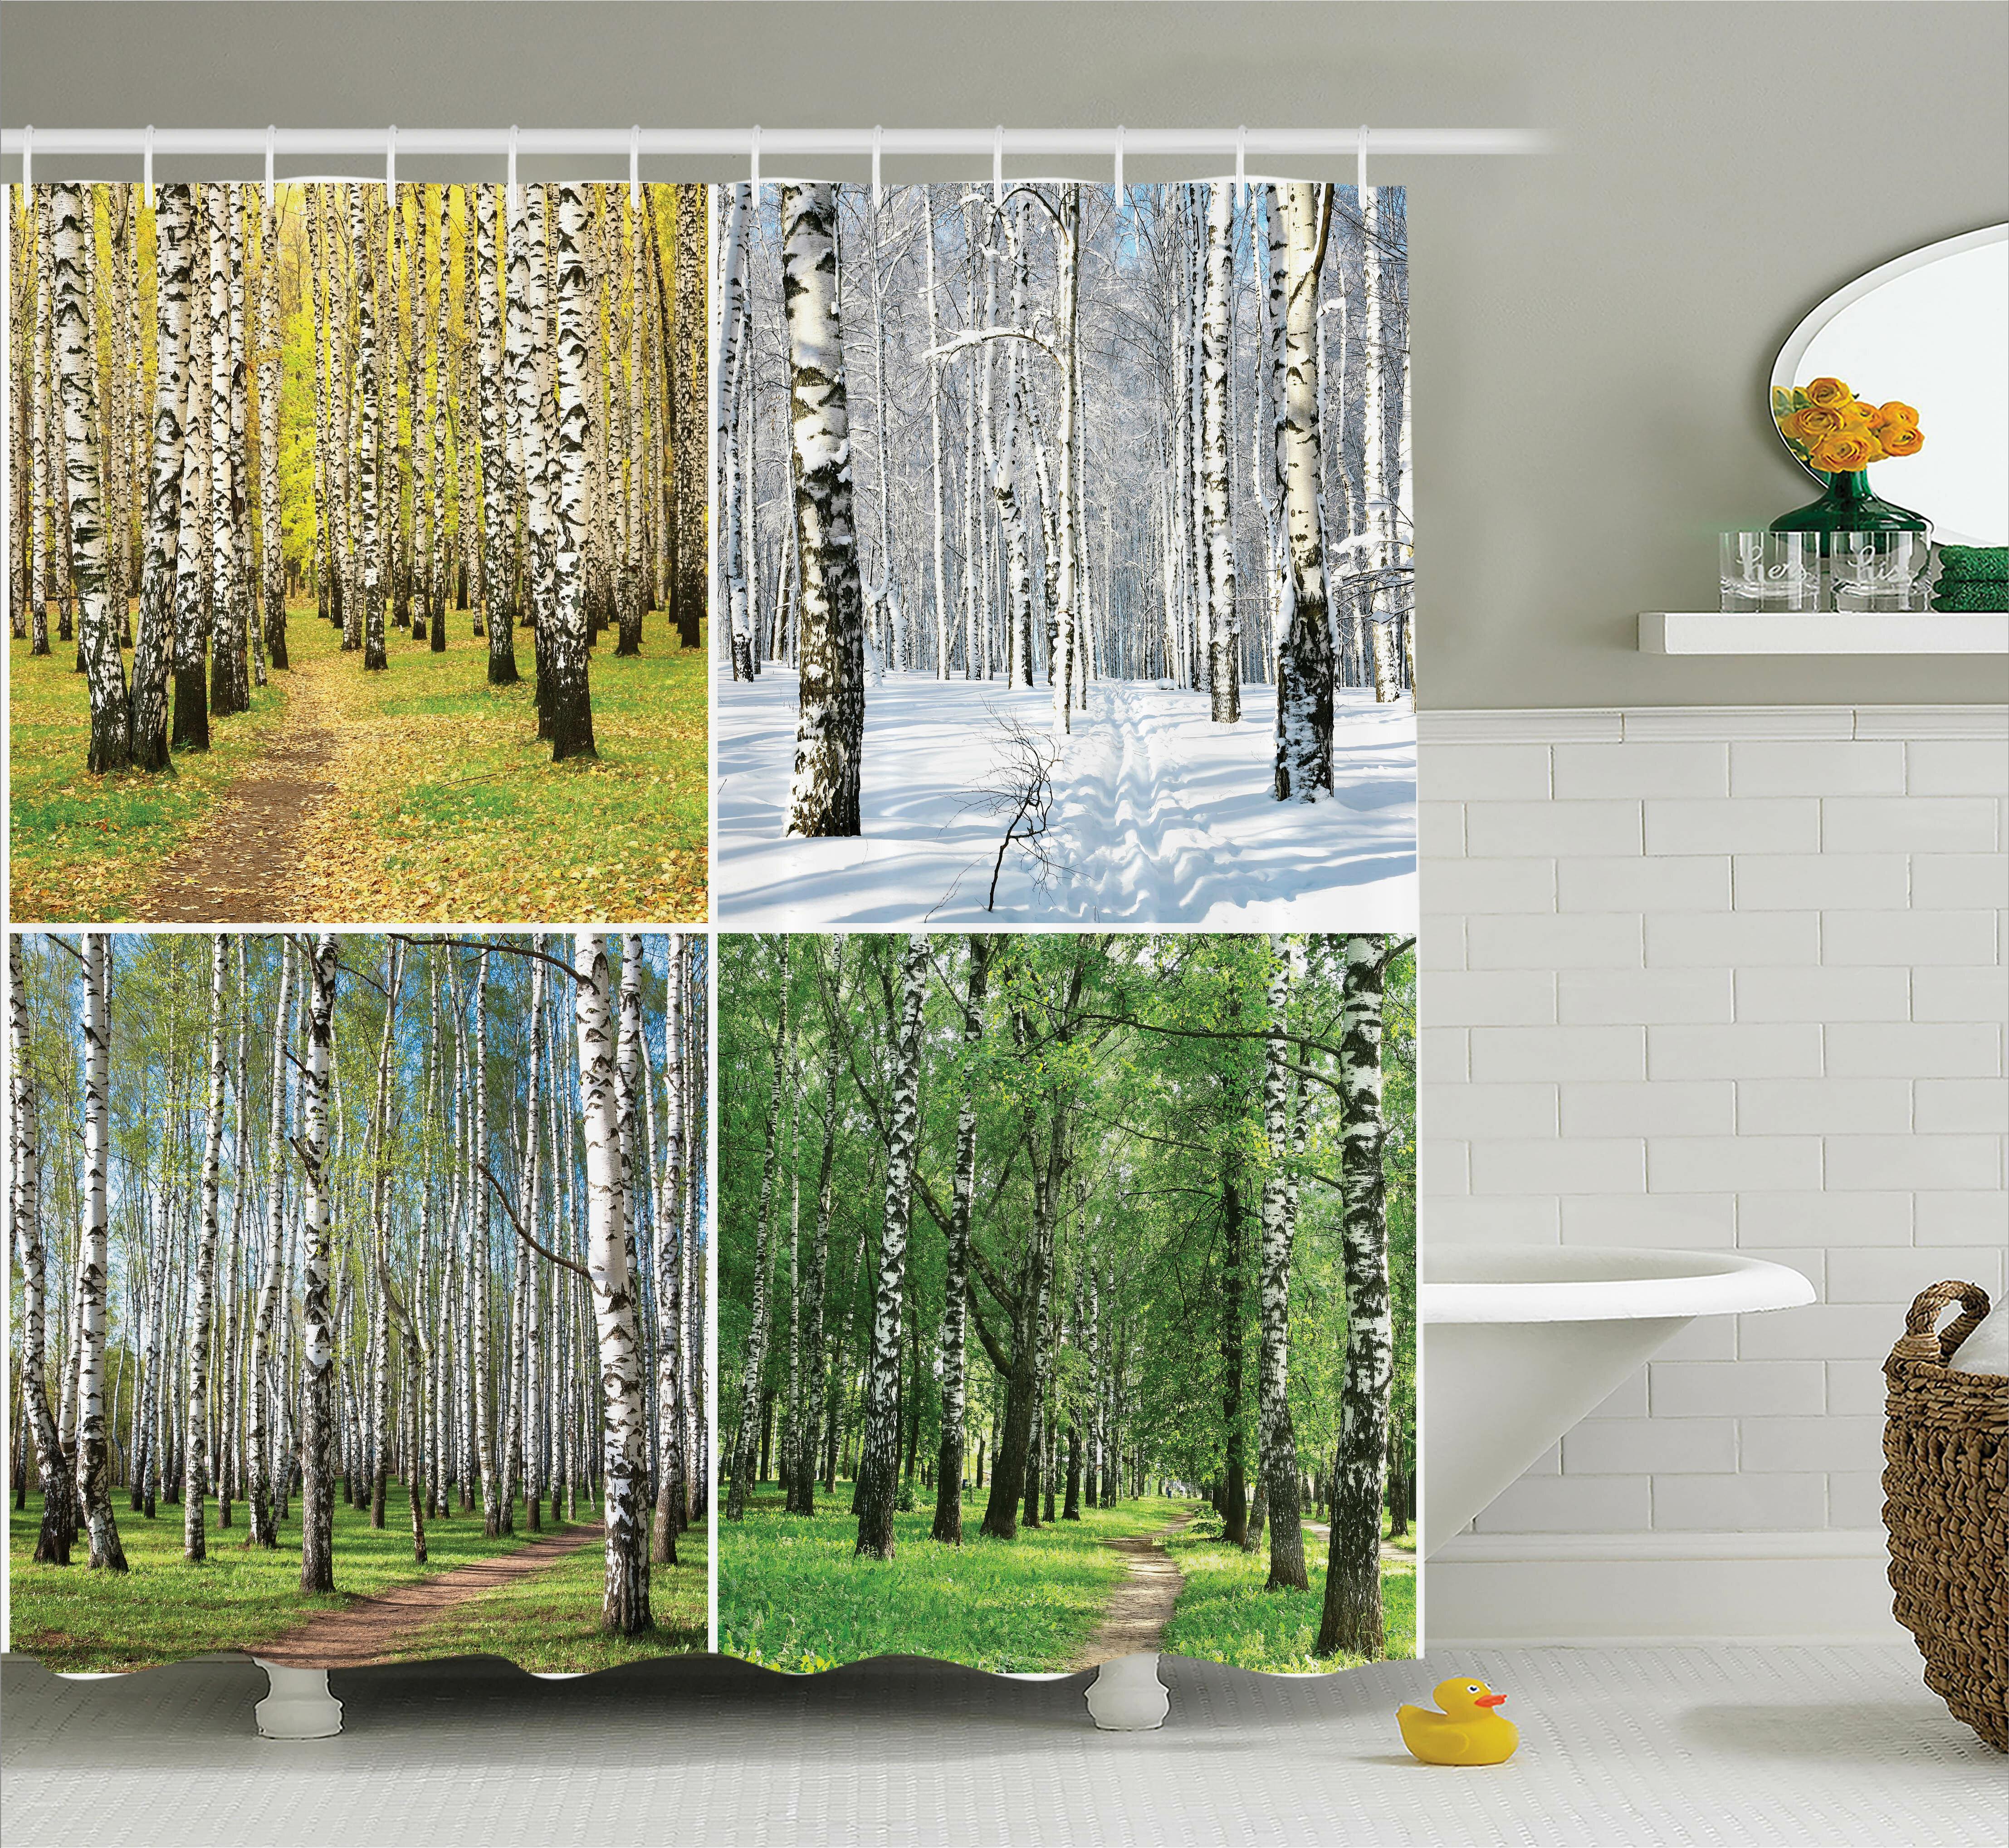 72x72/'/' Cute Fluffy four floret cats Bathroom Shower Curtain Waterproof Fabric